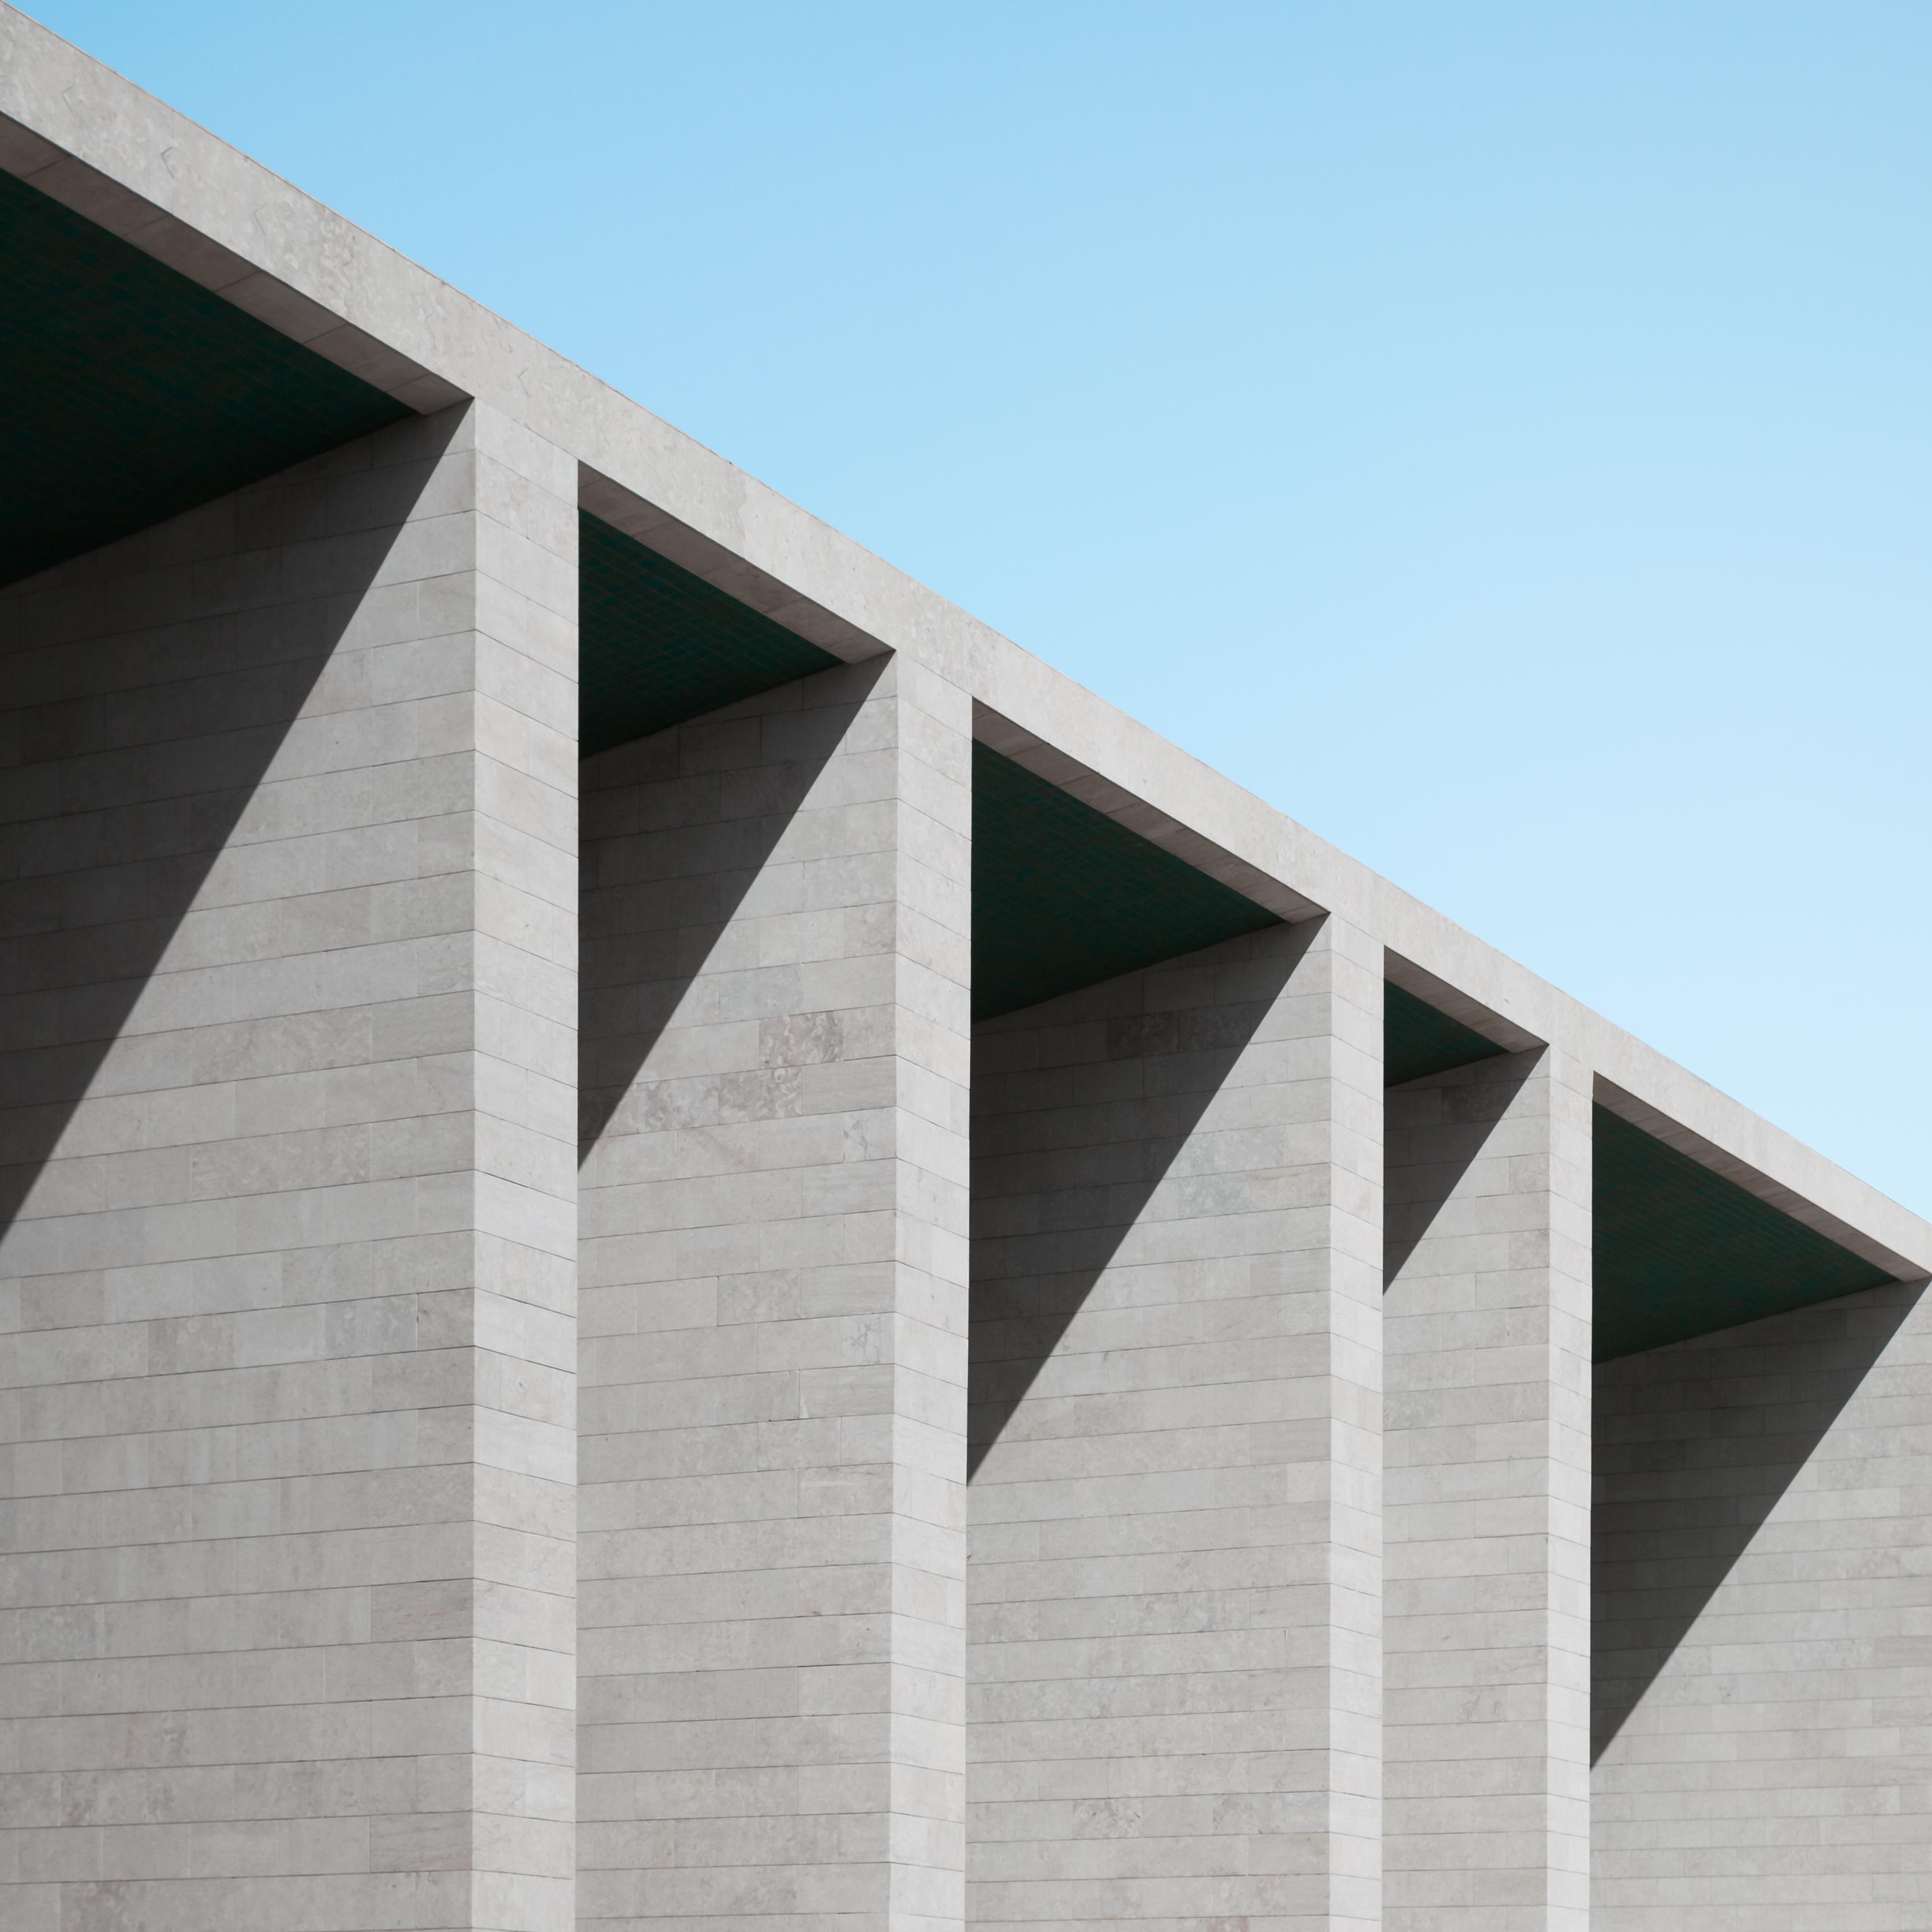 Anckor minimal architecture by usrdck for Design minimal